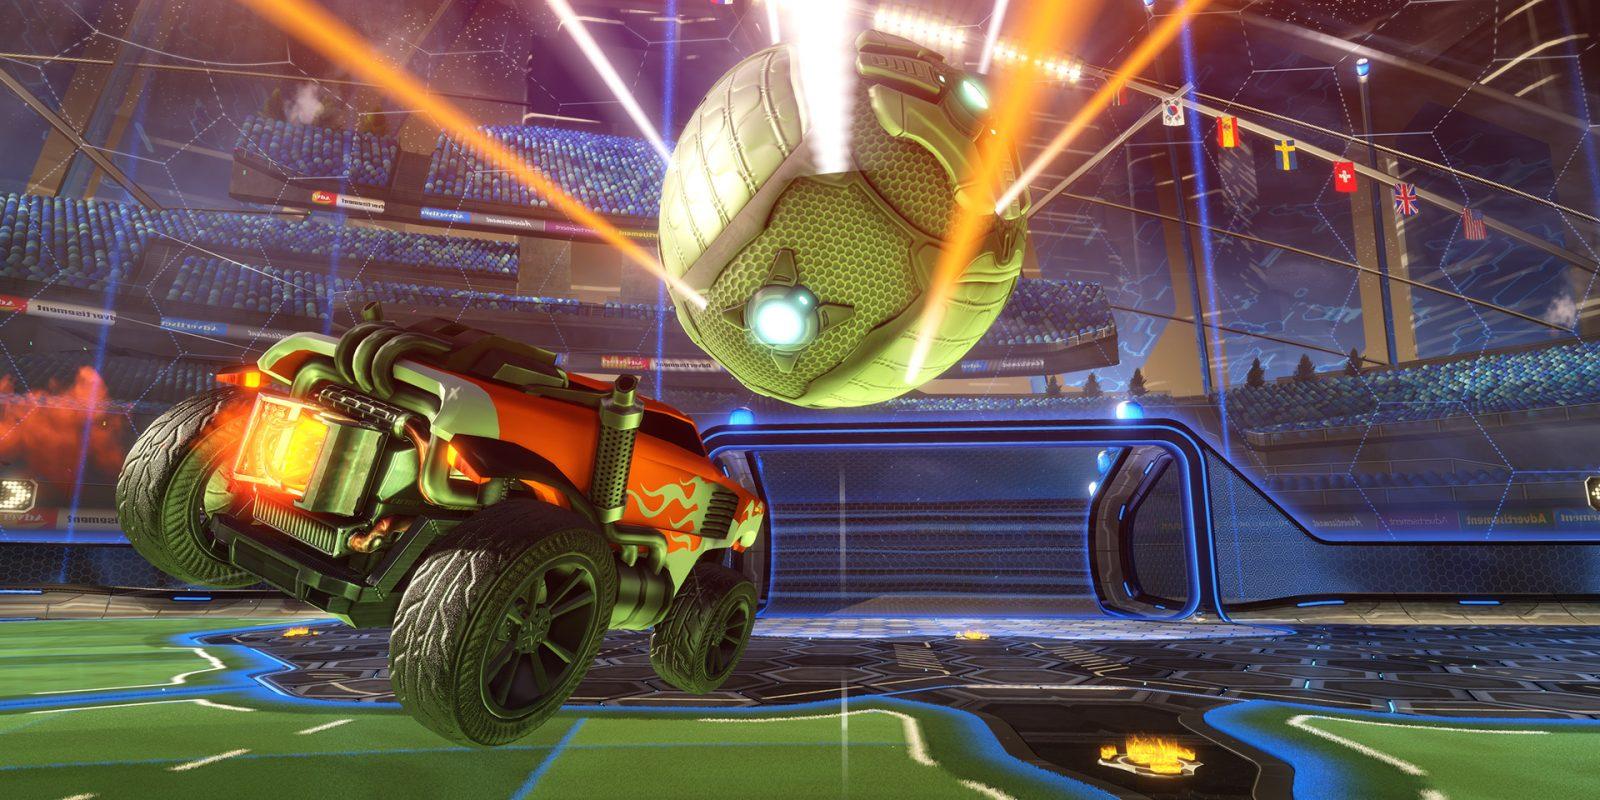 Games/Apps: Rocket League Collectors $20, Titanfall 2 $30